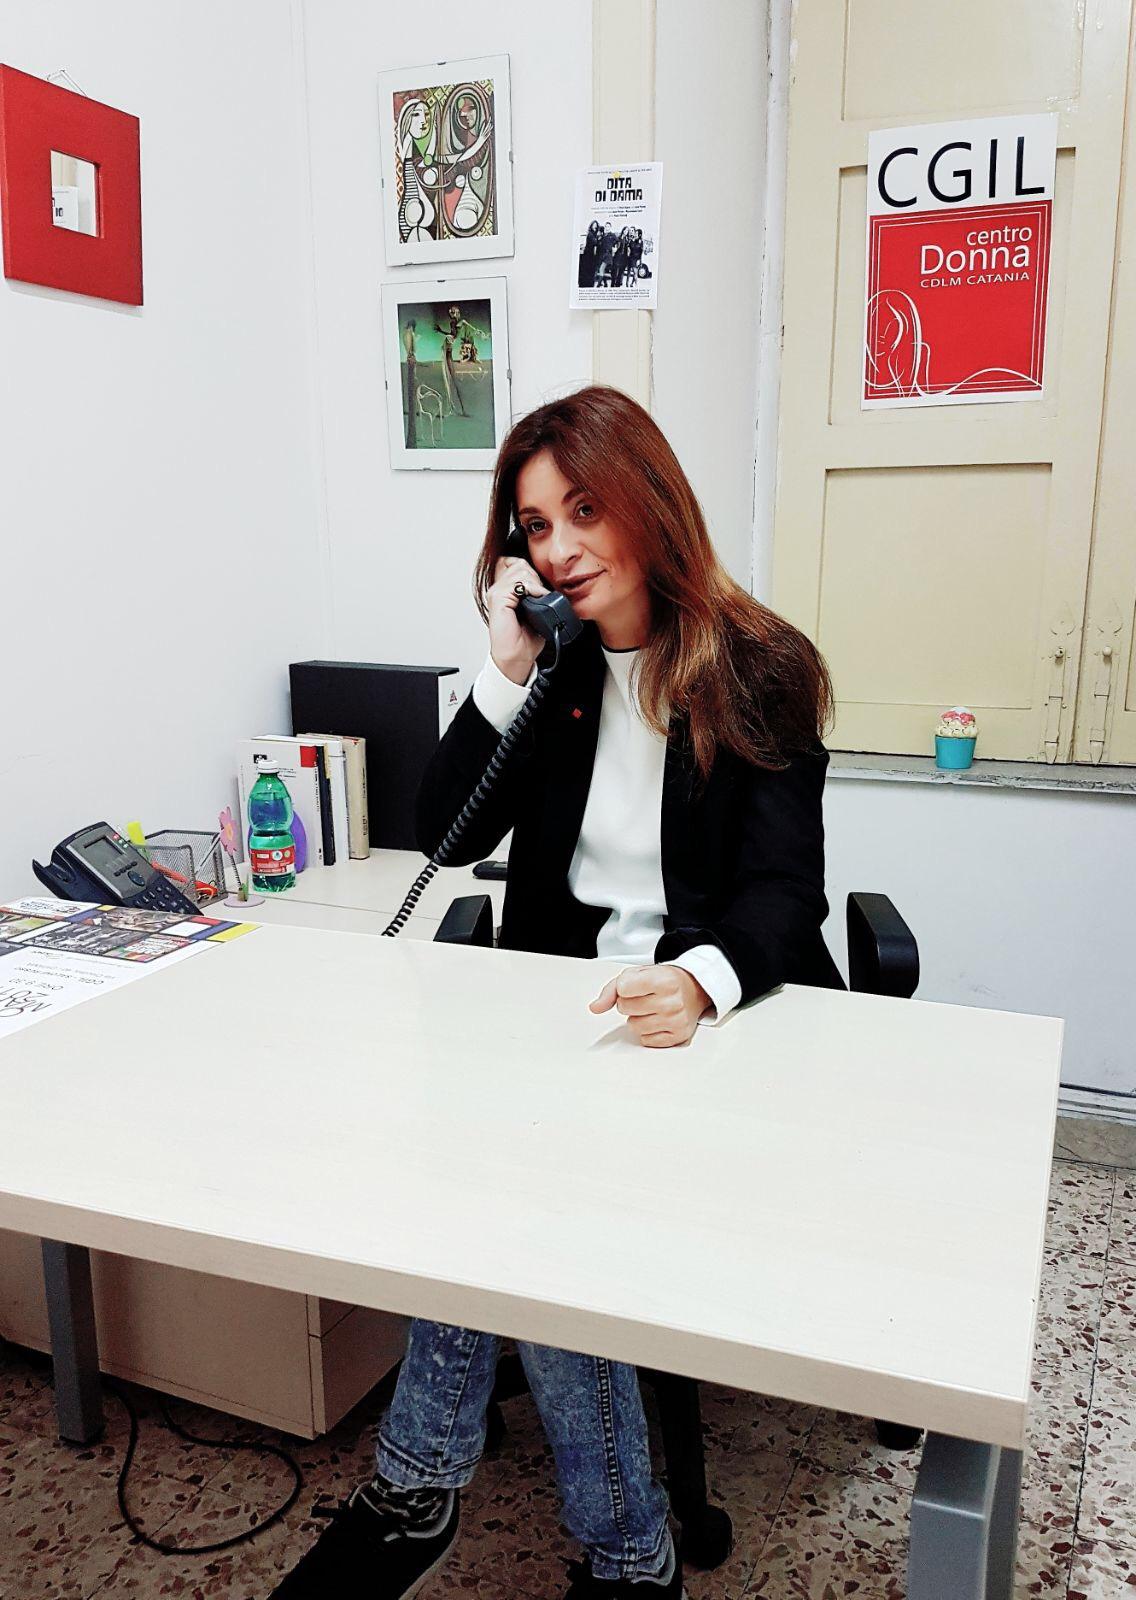 centro donna catania